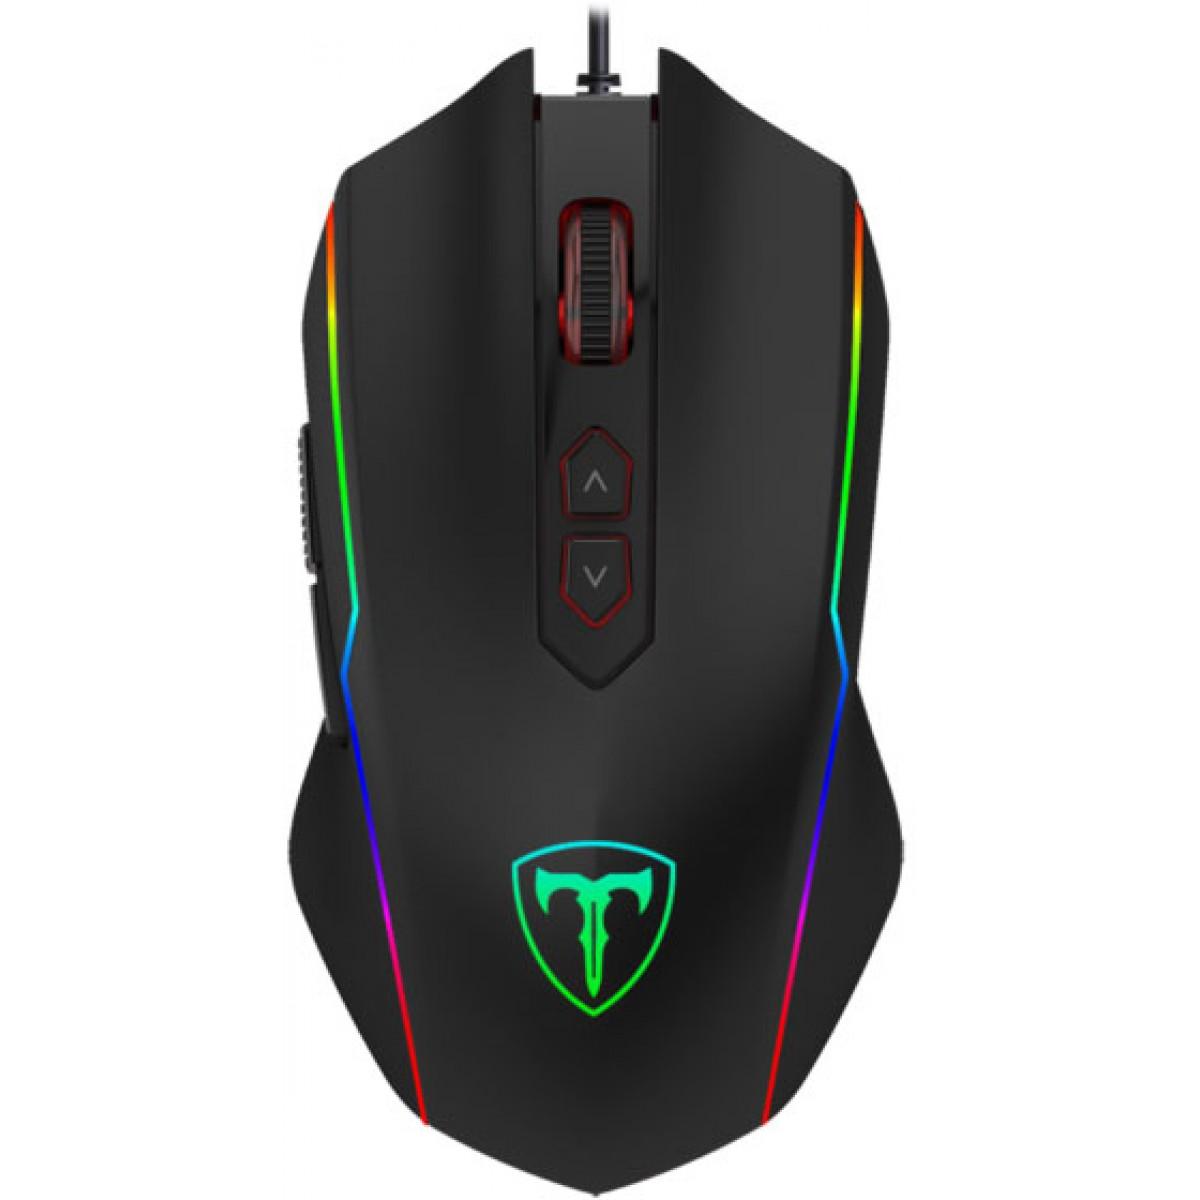 Mouse Gamer T-Dagger Sergeant RGB 4800 DPI, 7 Botões Programáveis, Black